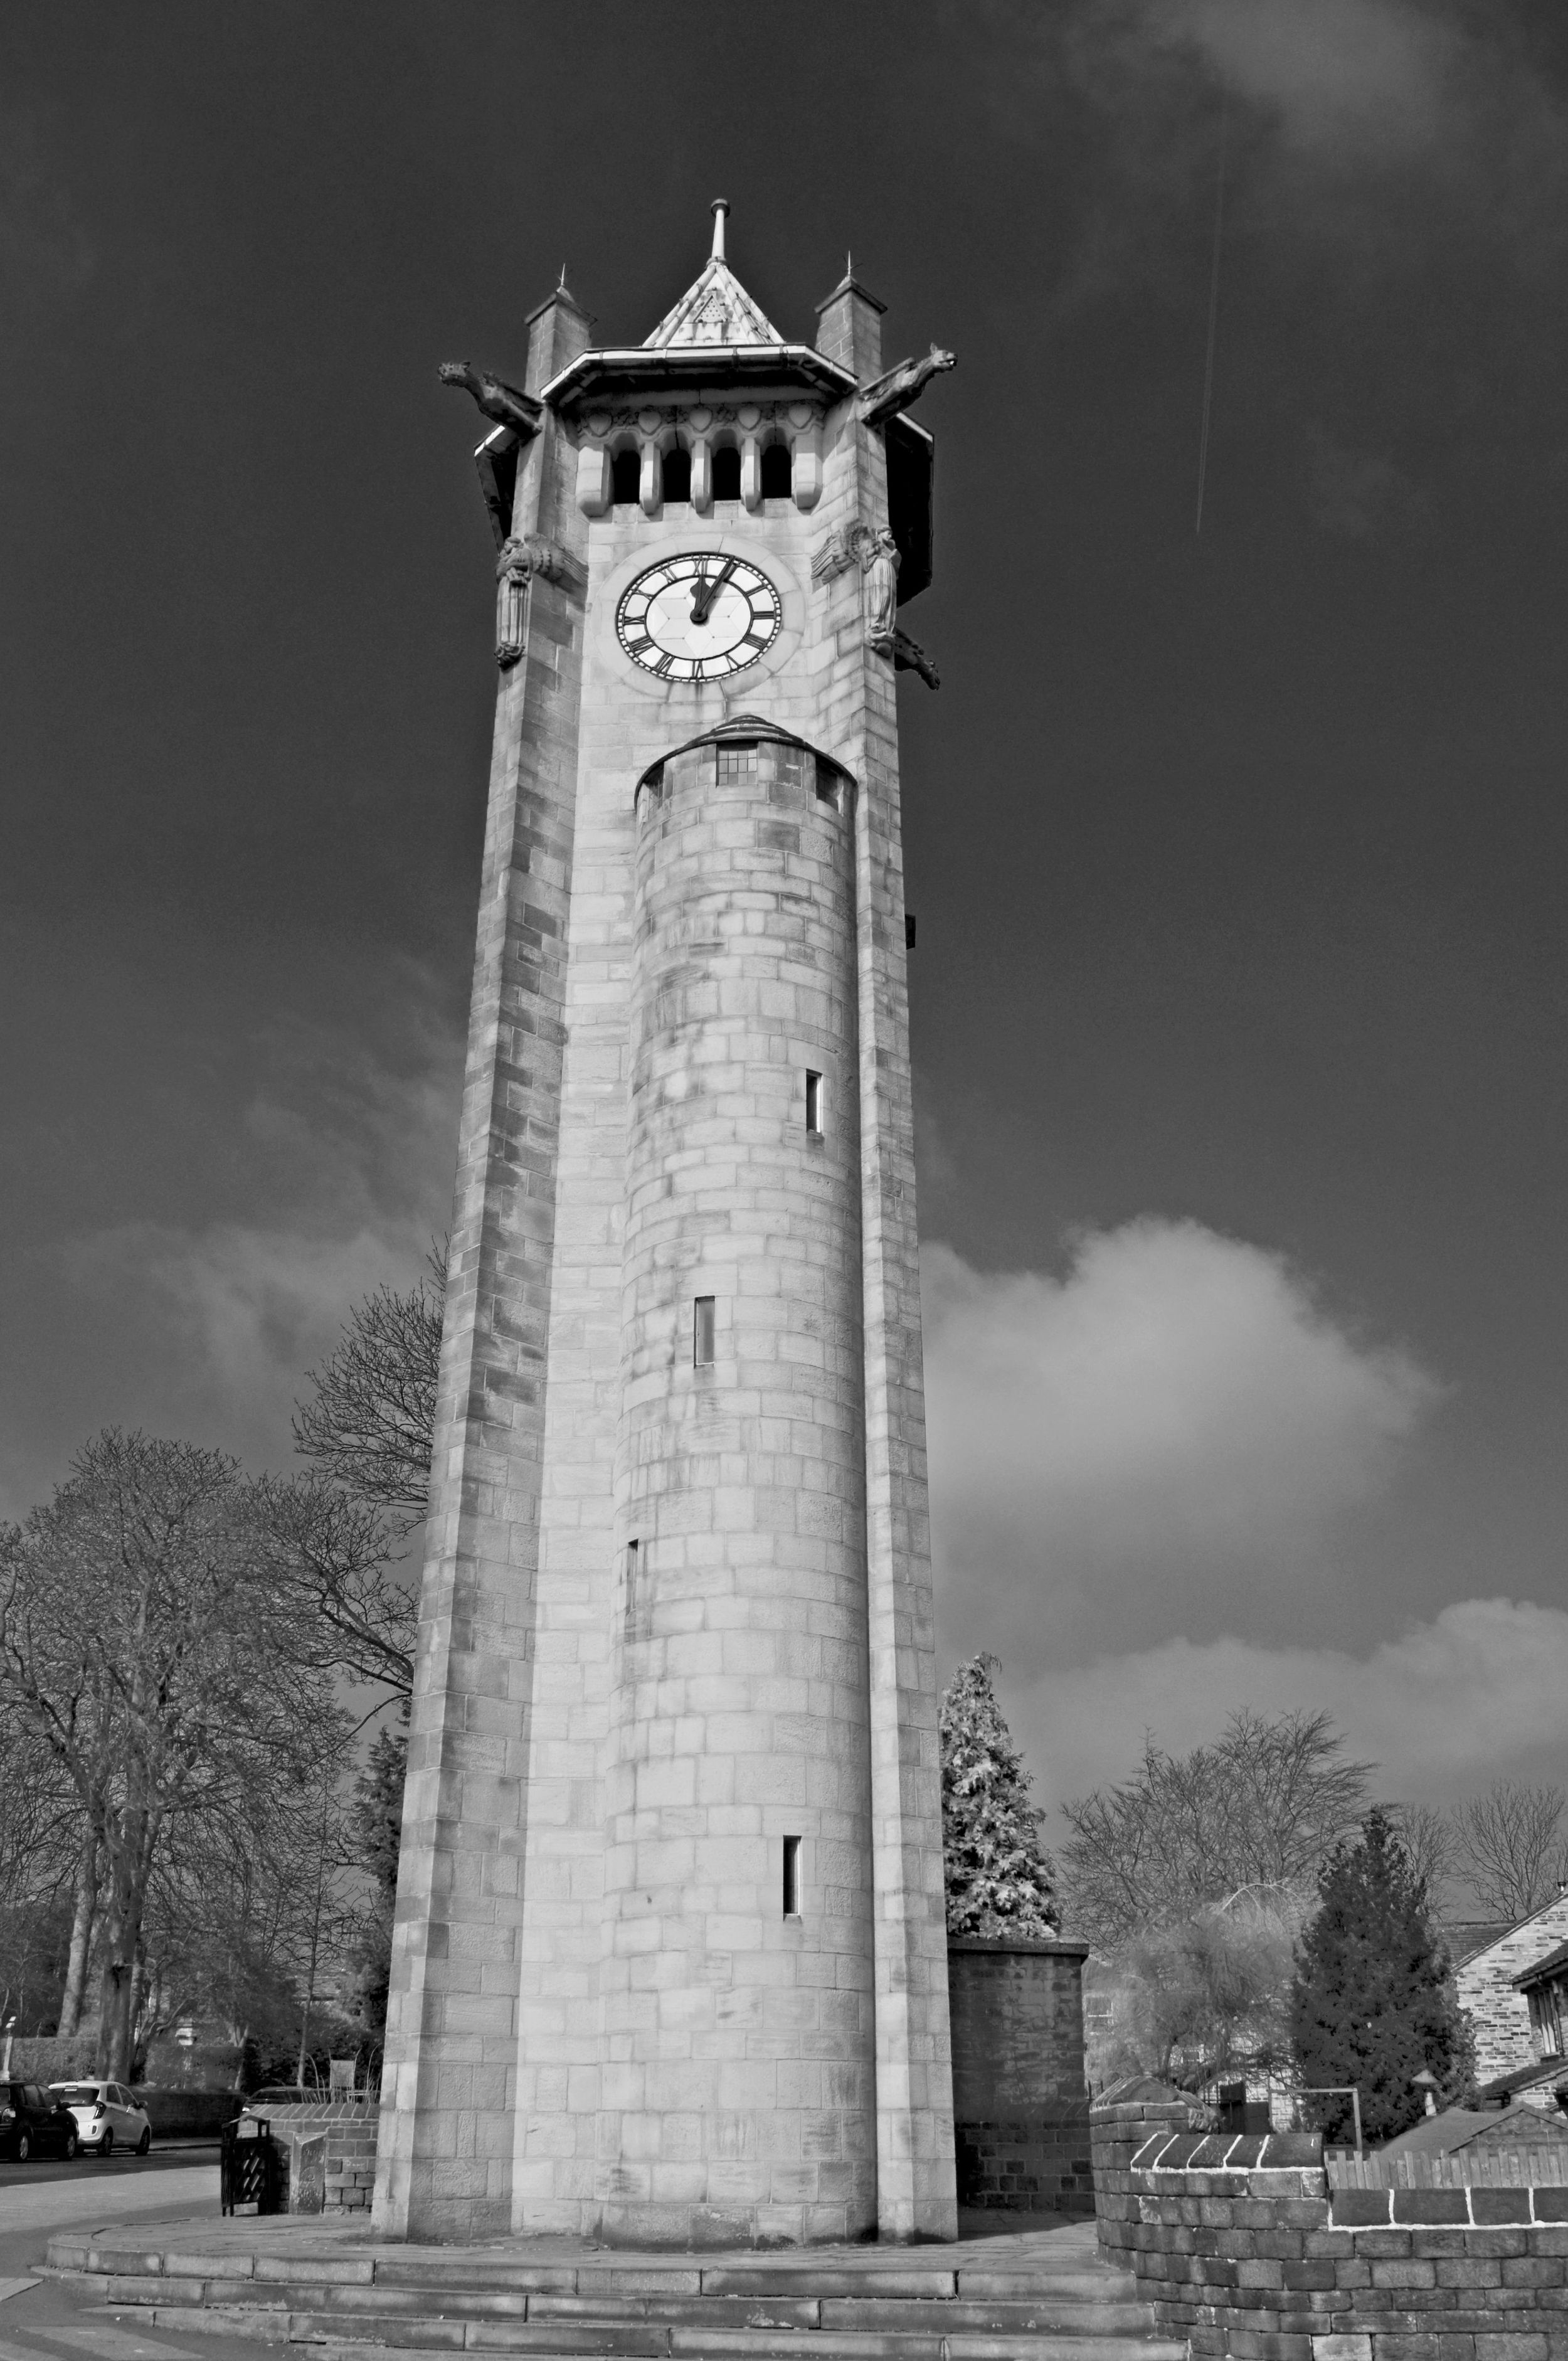 Lindley Clocktower